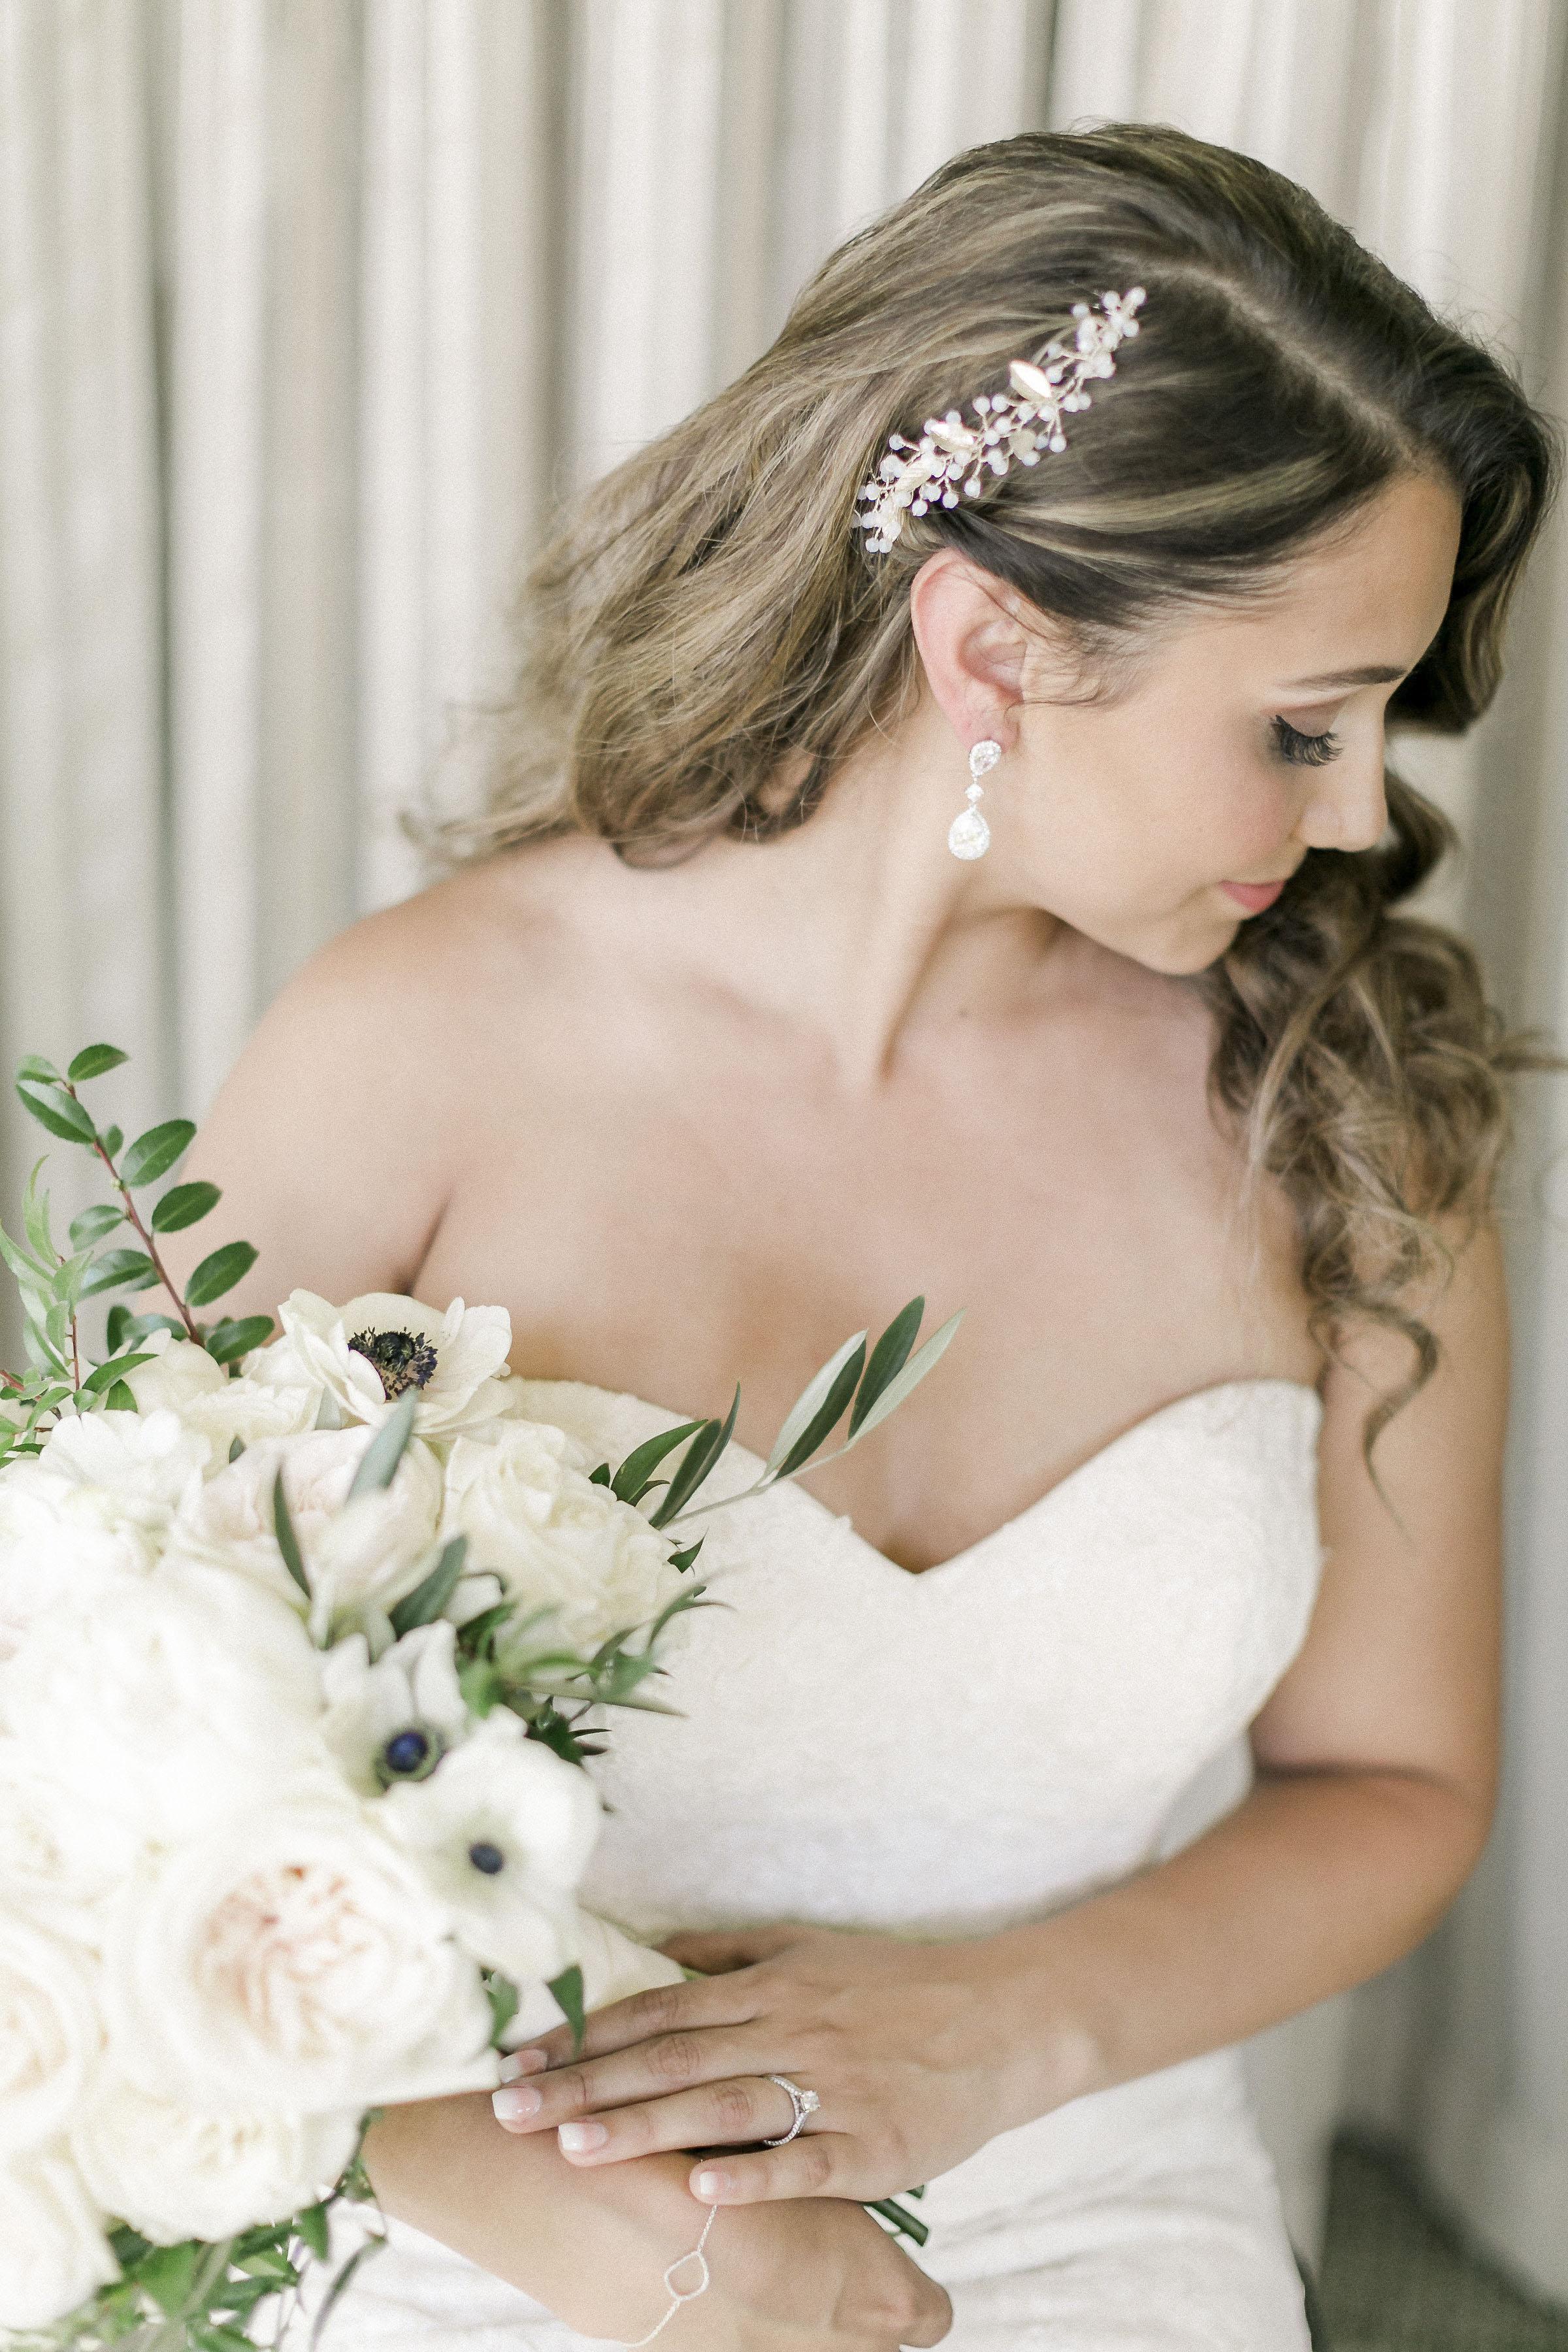 Domenica Beauty _ Hair and Makeup Artist _Wedding _ Temecula, CA _ Samantha and Derek _ 25.JPG